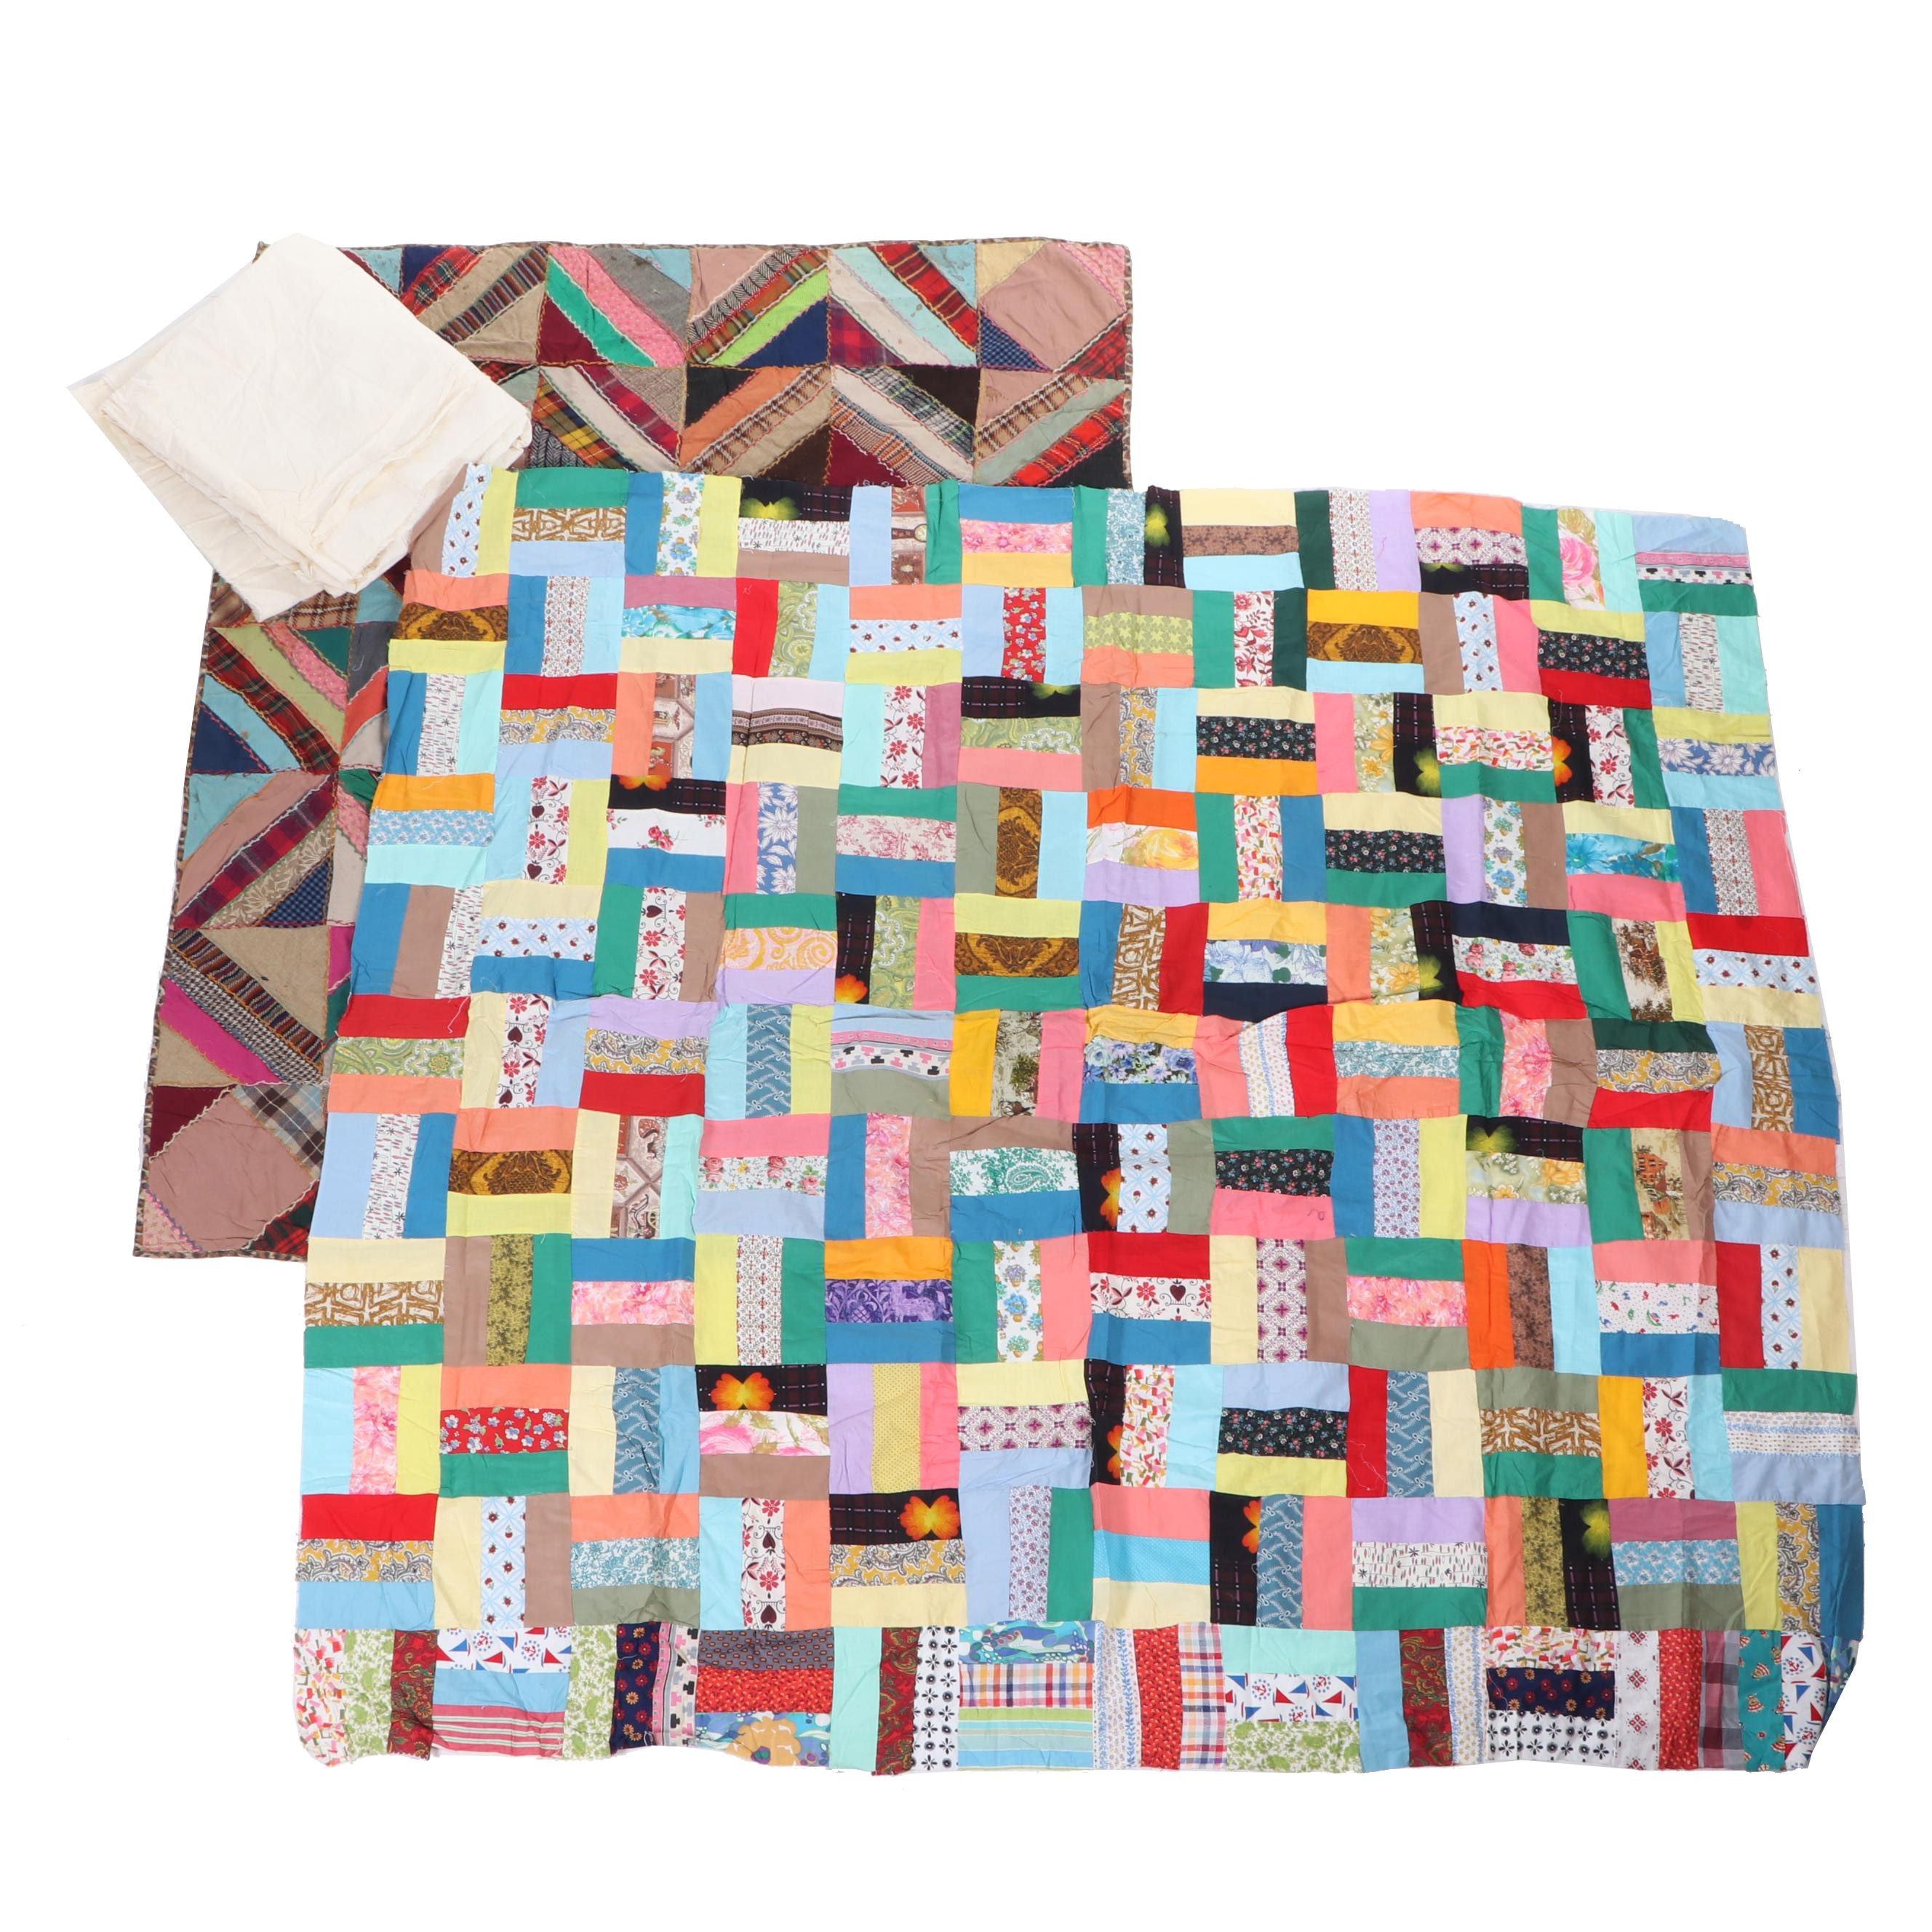 Handmade Patchwork Quilts